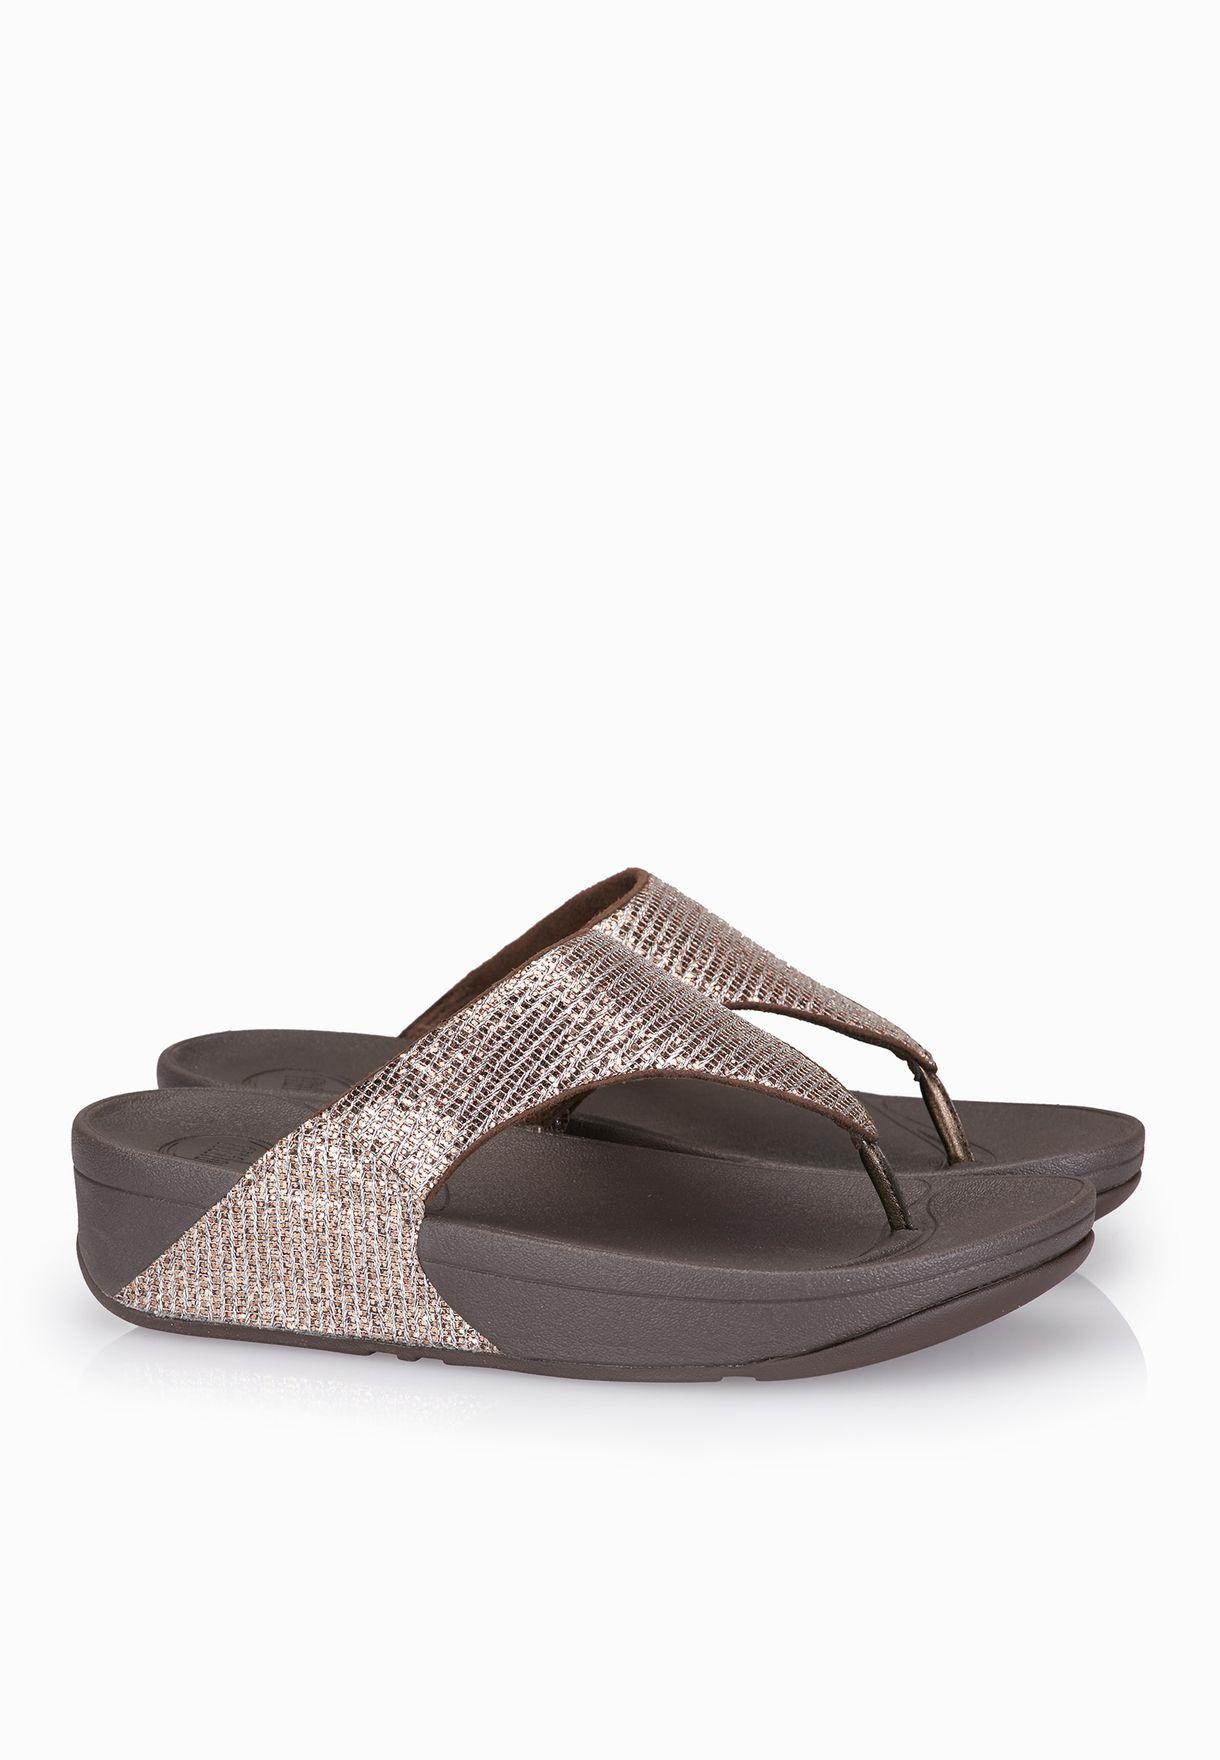 60434dab586155 Shop Fitflop bronze Lulu Superglitz Sandals 599-012 for Women in UAE ...